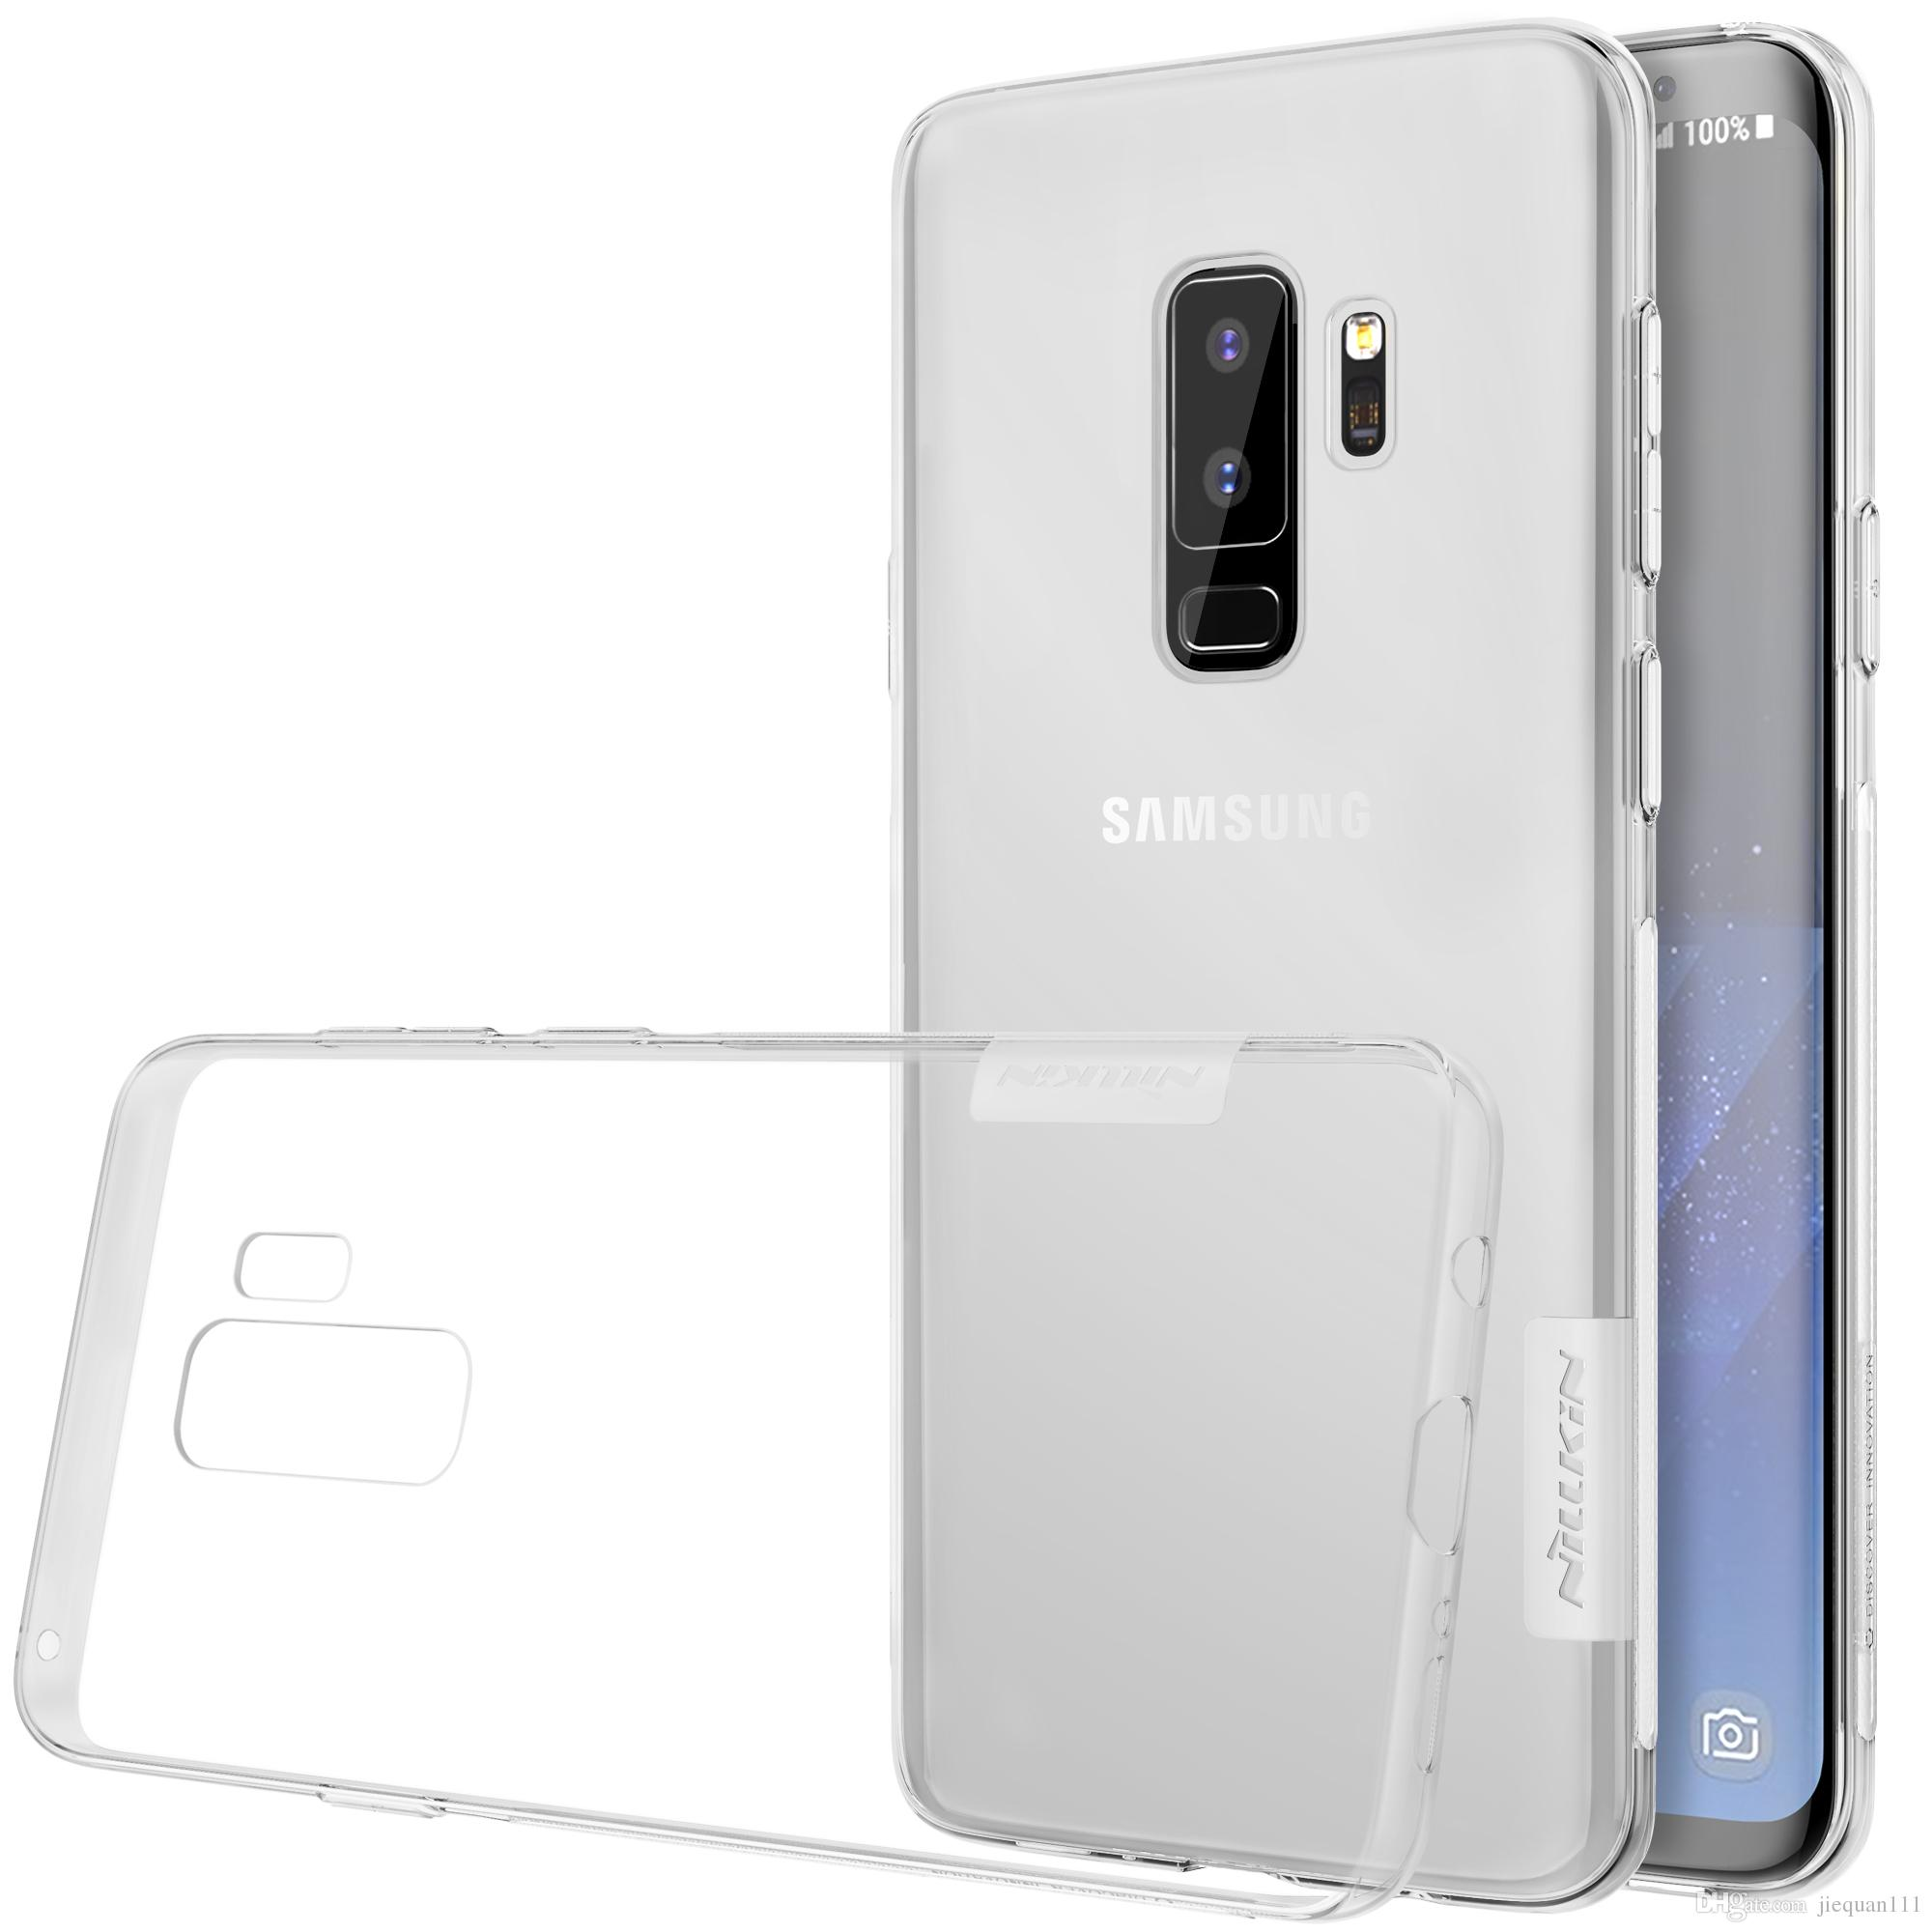 Htc e M7 Hüllen Für Samsung Galaxy S9 Plus Fall Galaxy S9 Plus Tpu Fall Nillkin Nature Series Zurück Abdeckung Clear Soft Case Für Samsung S9 Plus